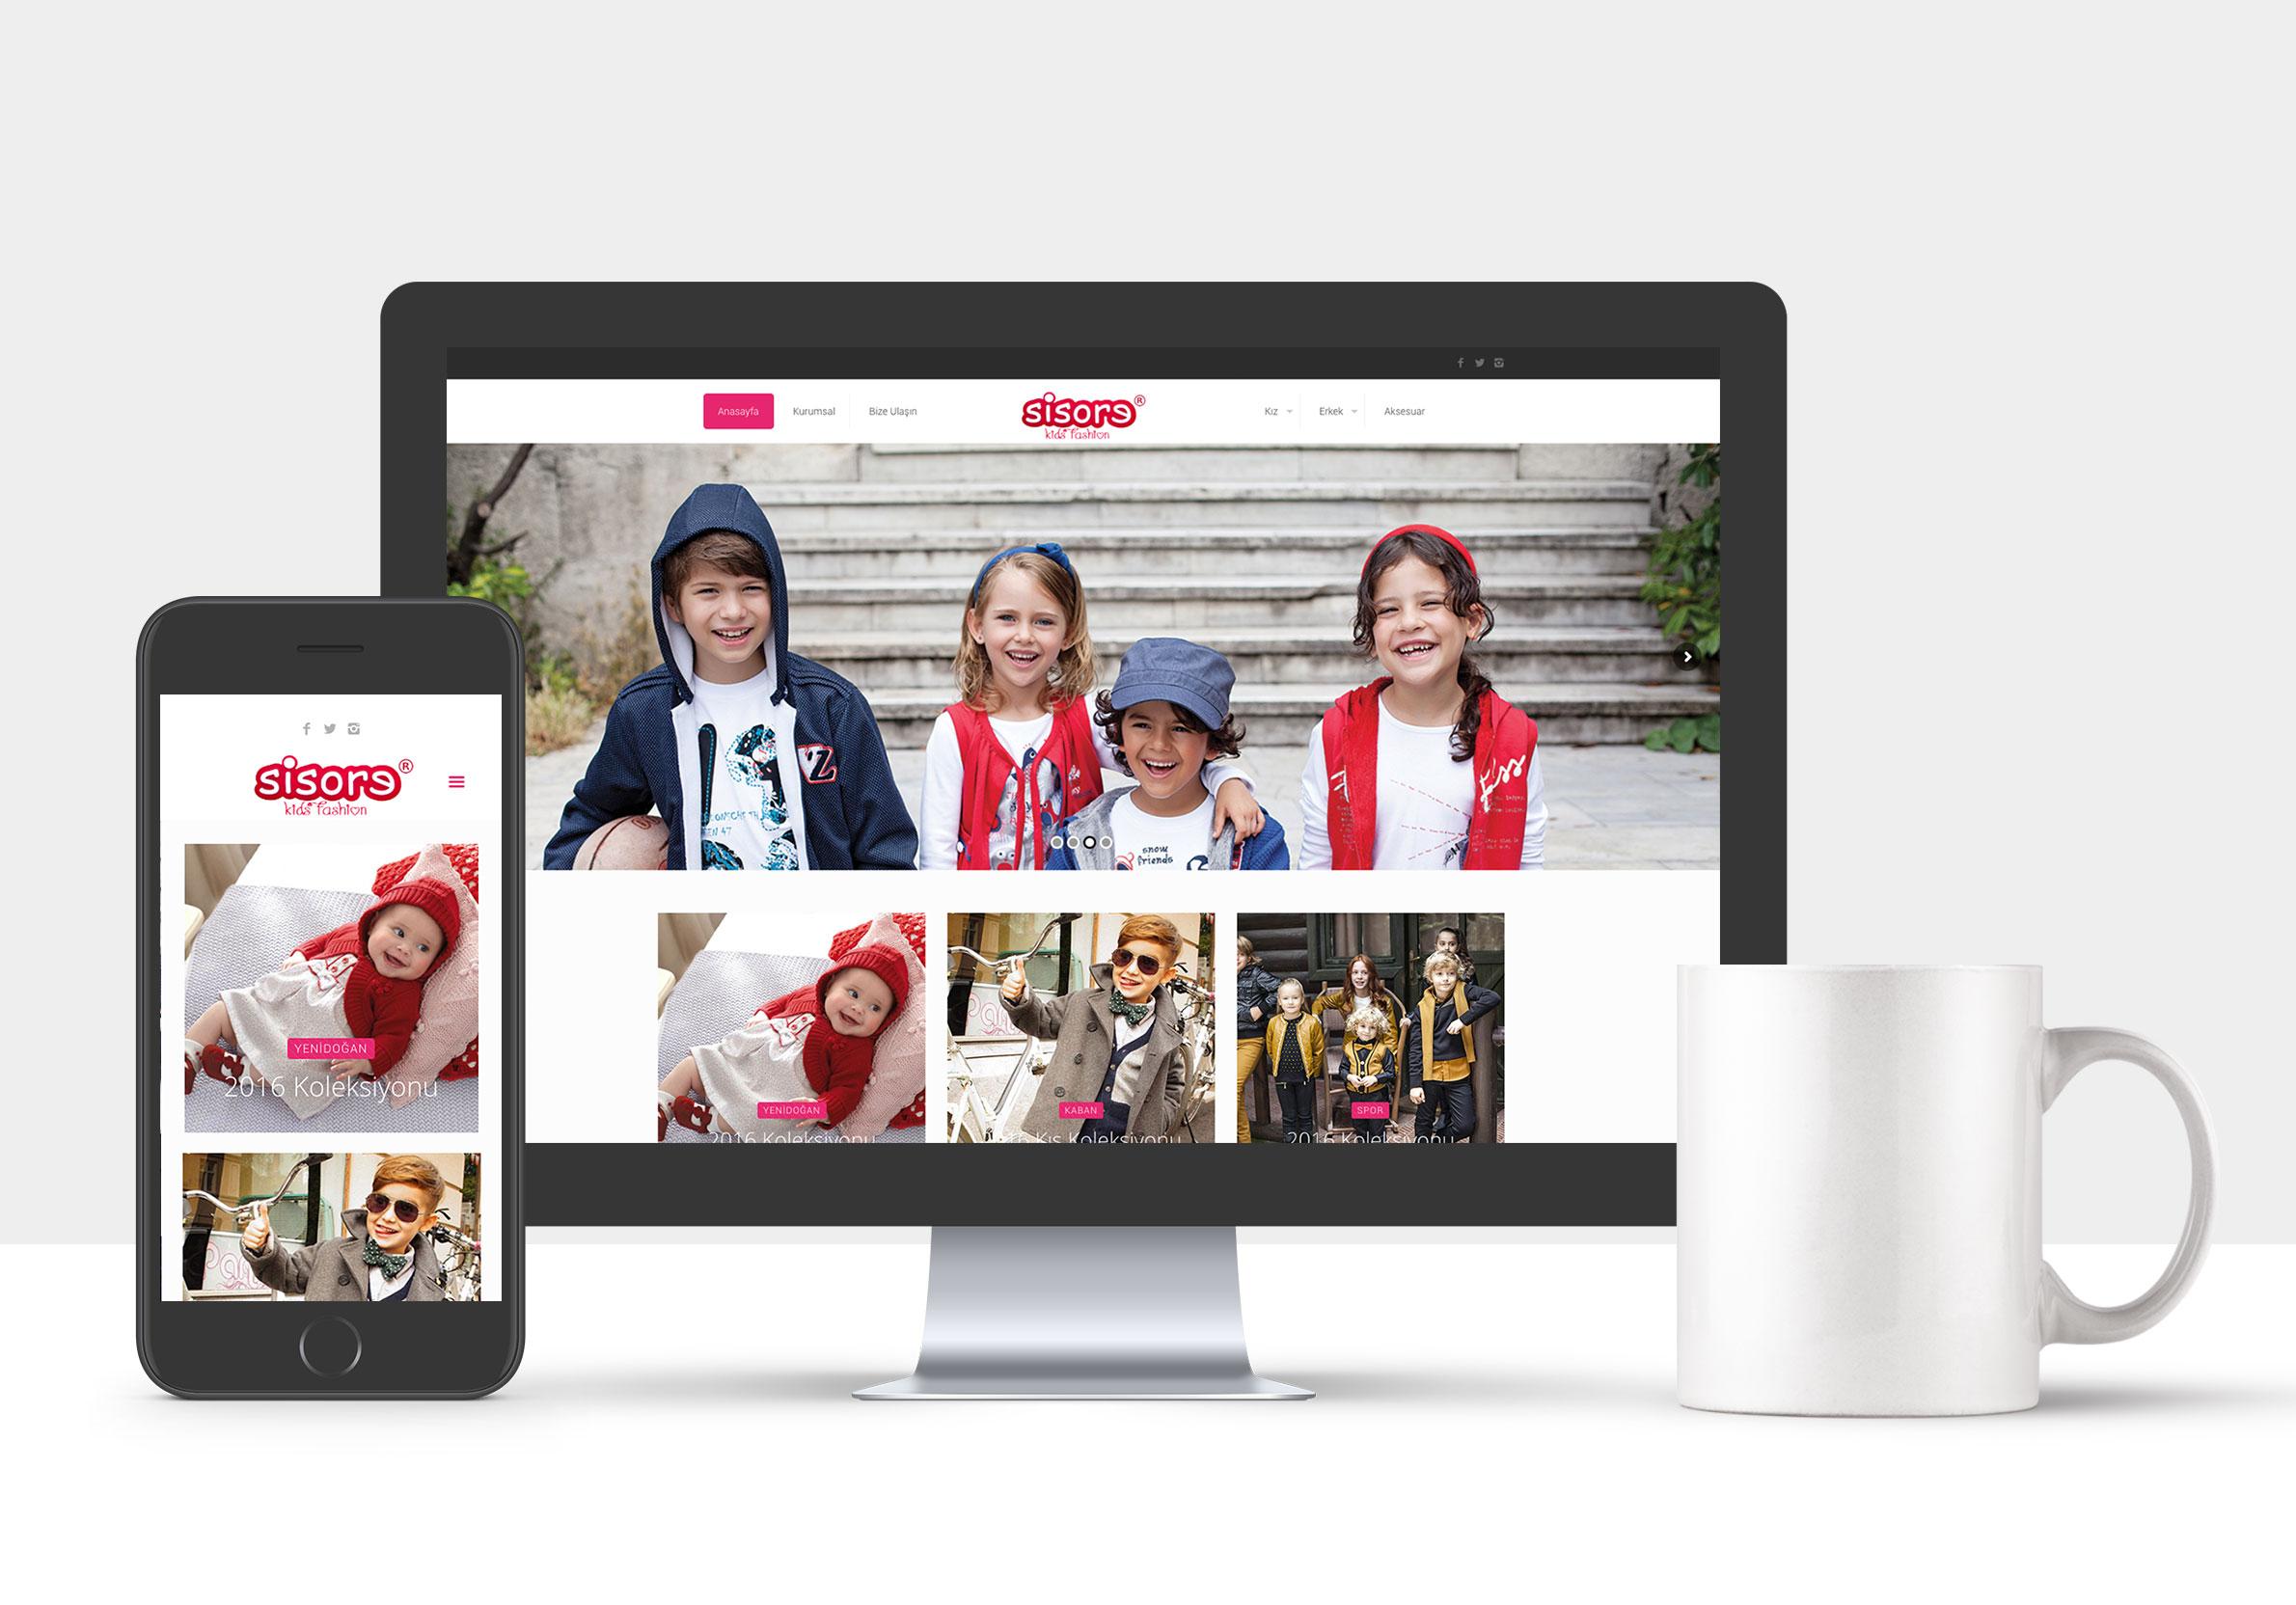 sisore-kids-kurumsal-web-sitesi